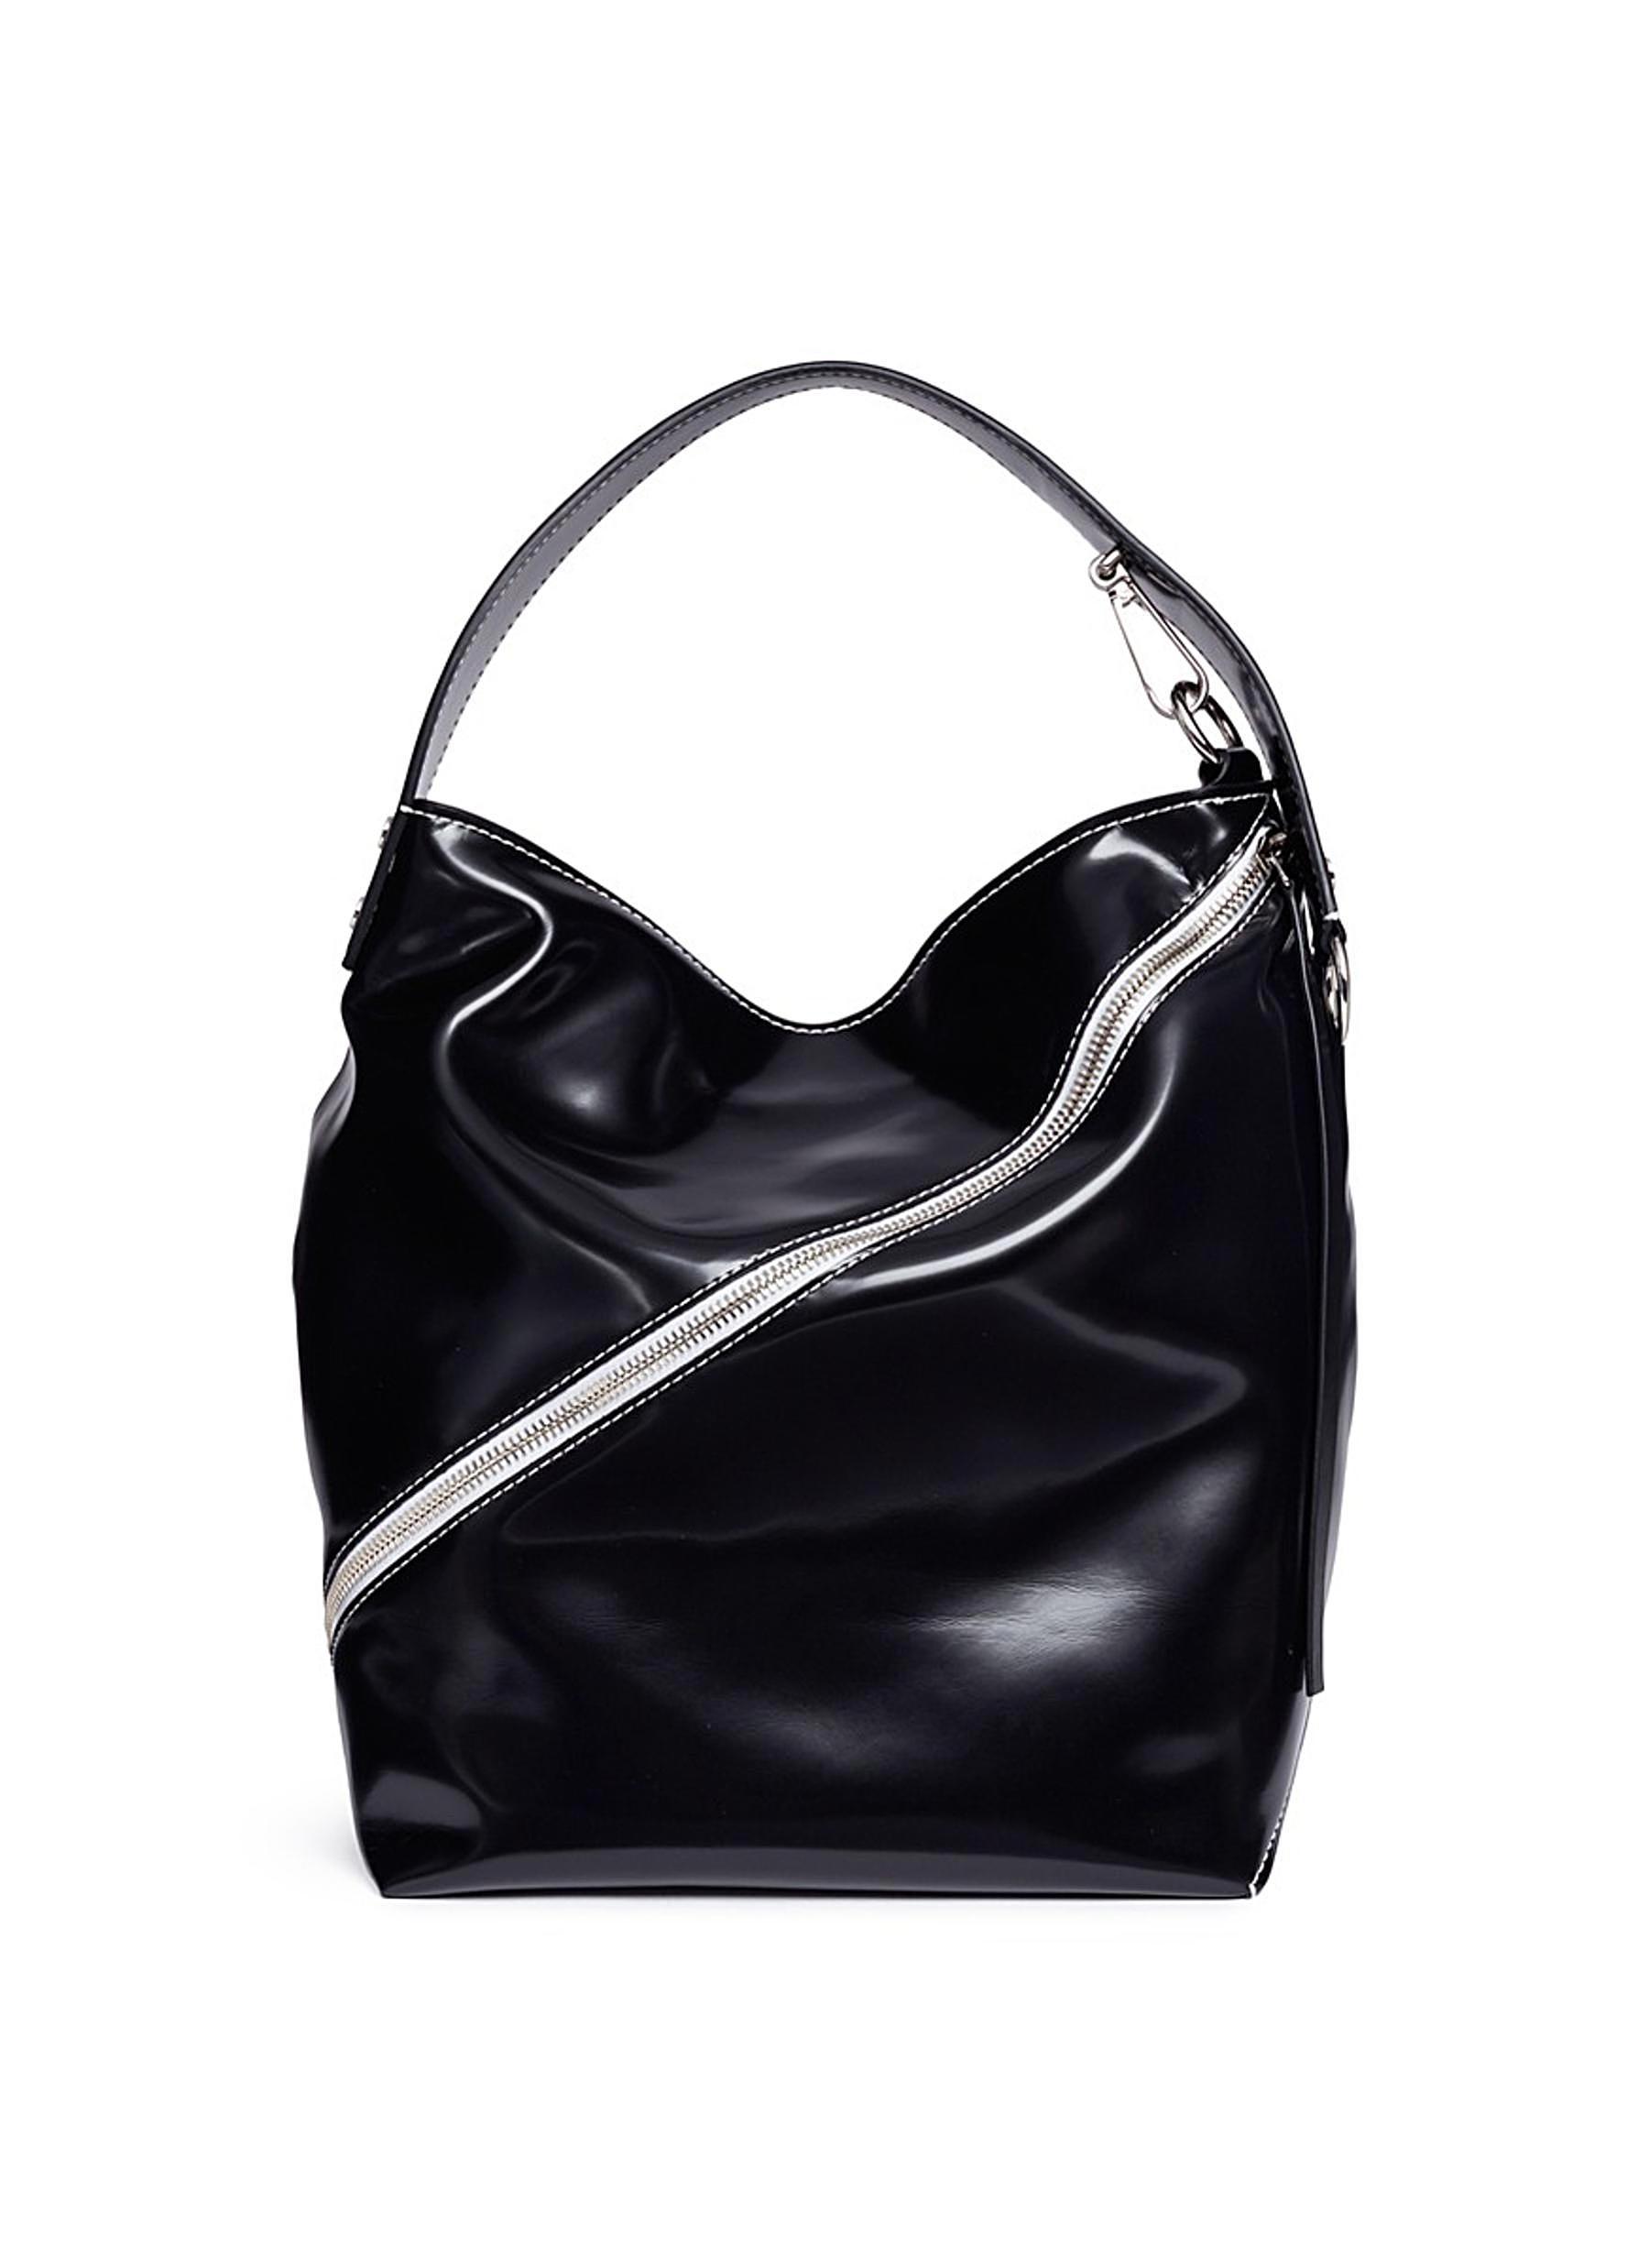 'Hobo' medium leather handbag